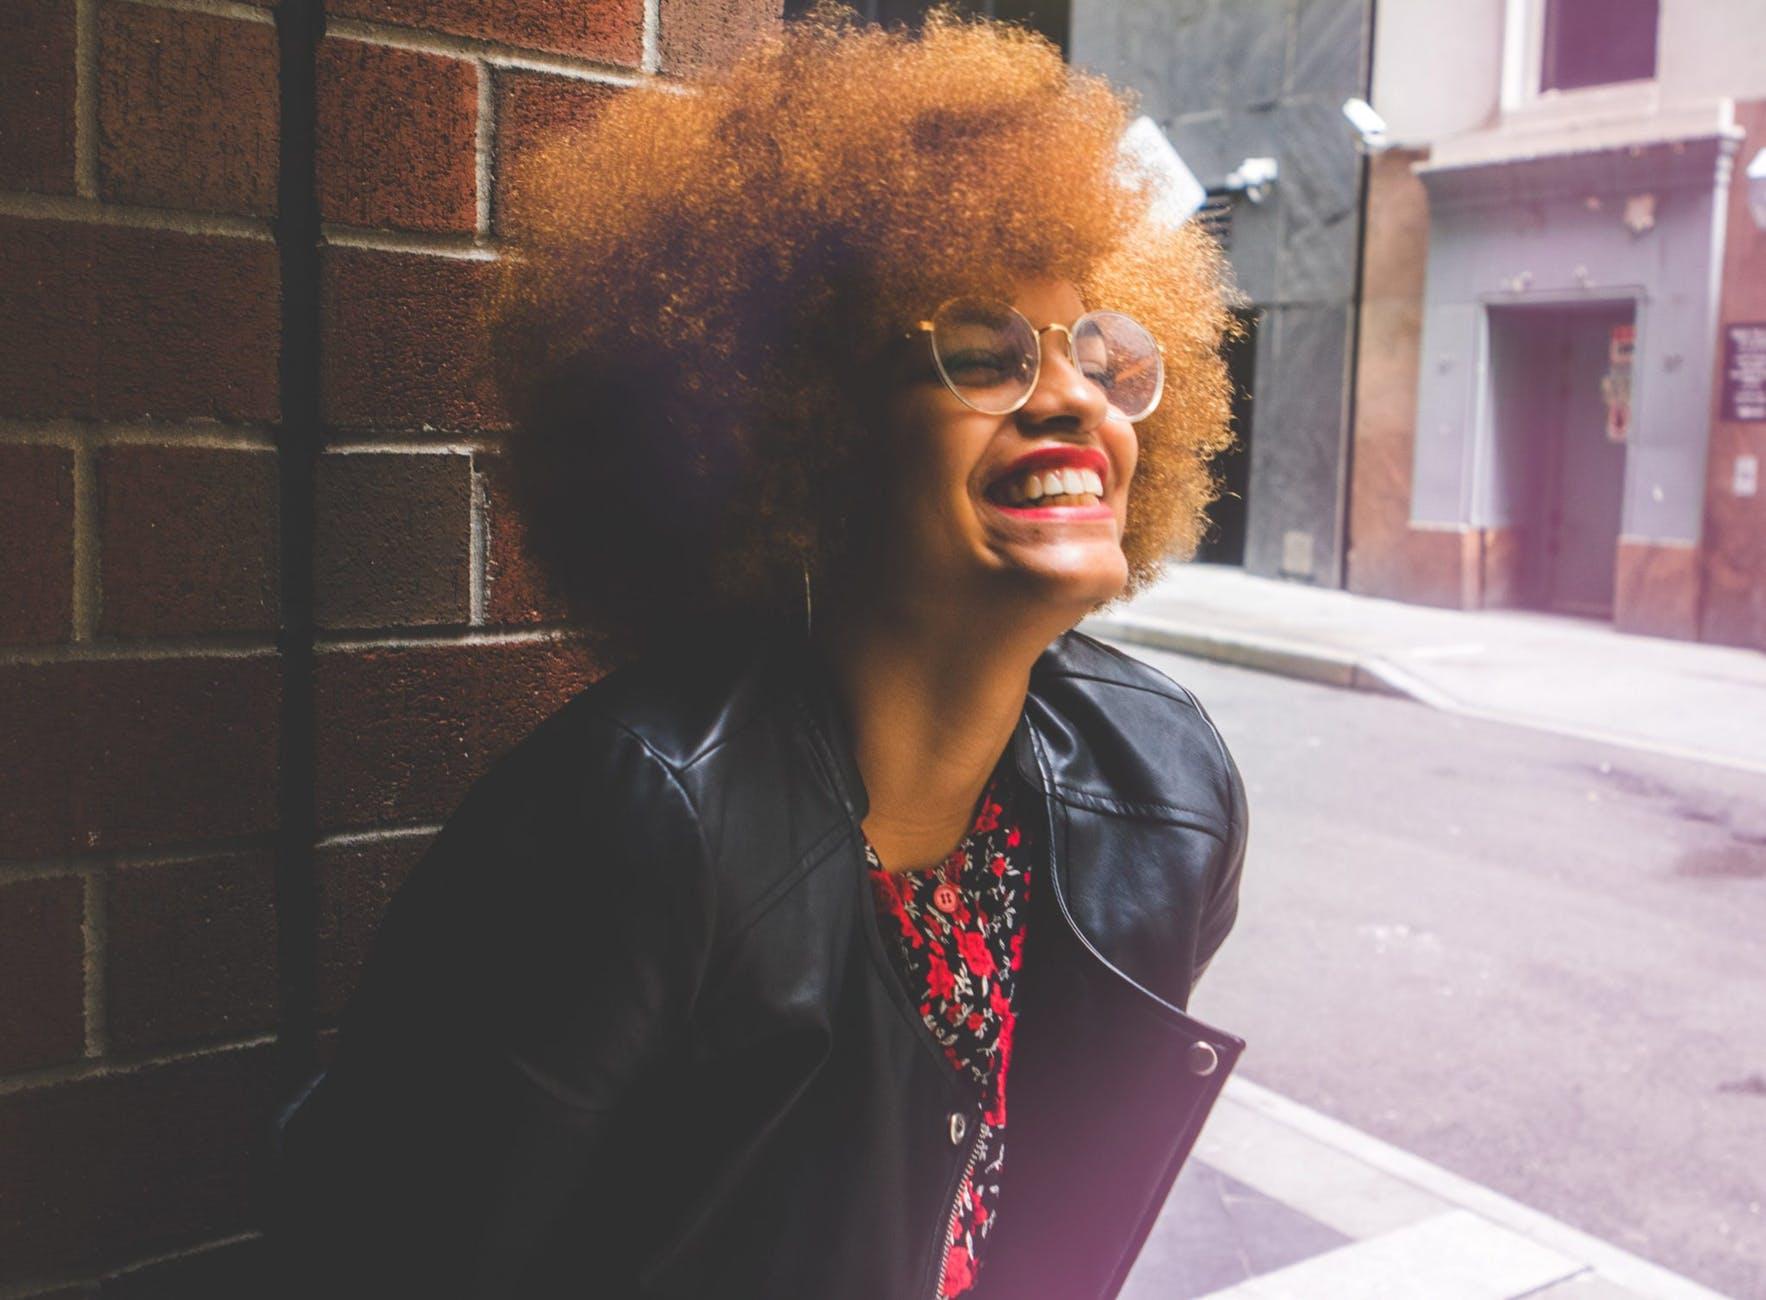 cabelo loiro cacheado 1 - Cabelo loiro cacheado e crespo: ideias de looks para apostar